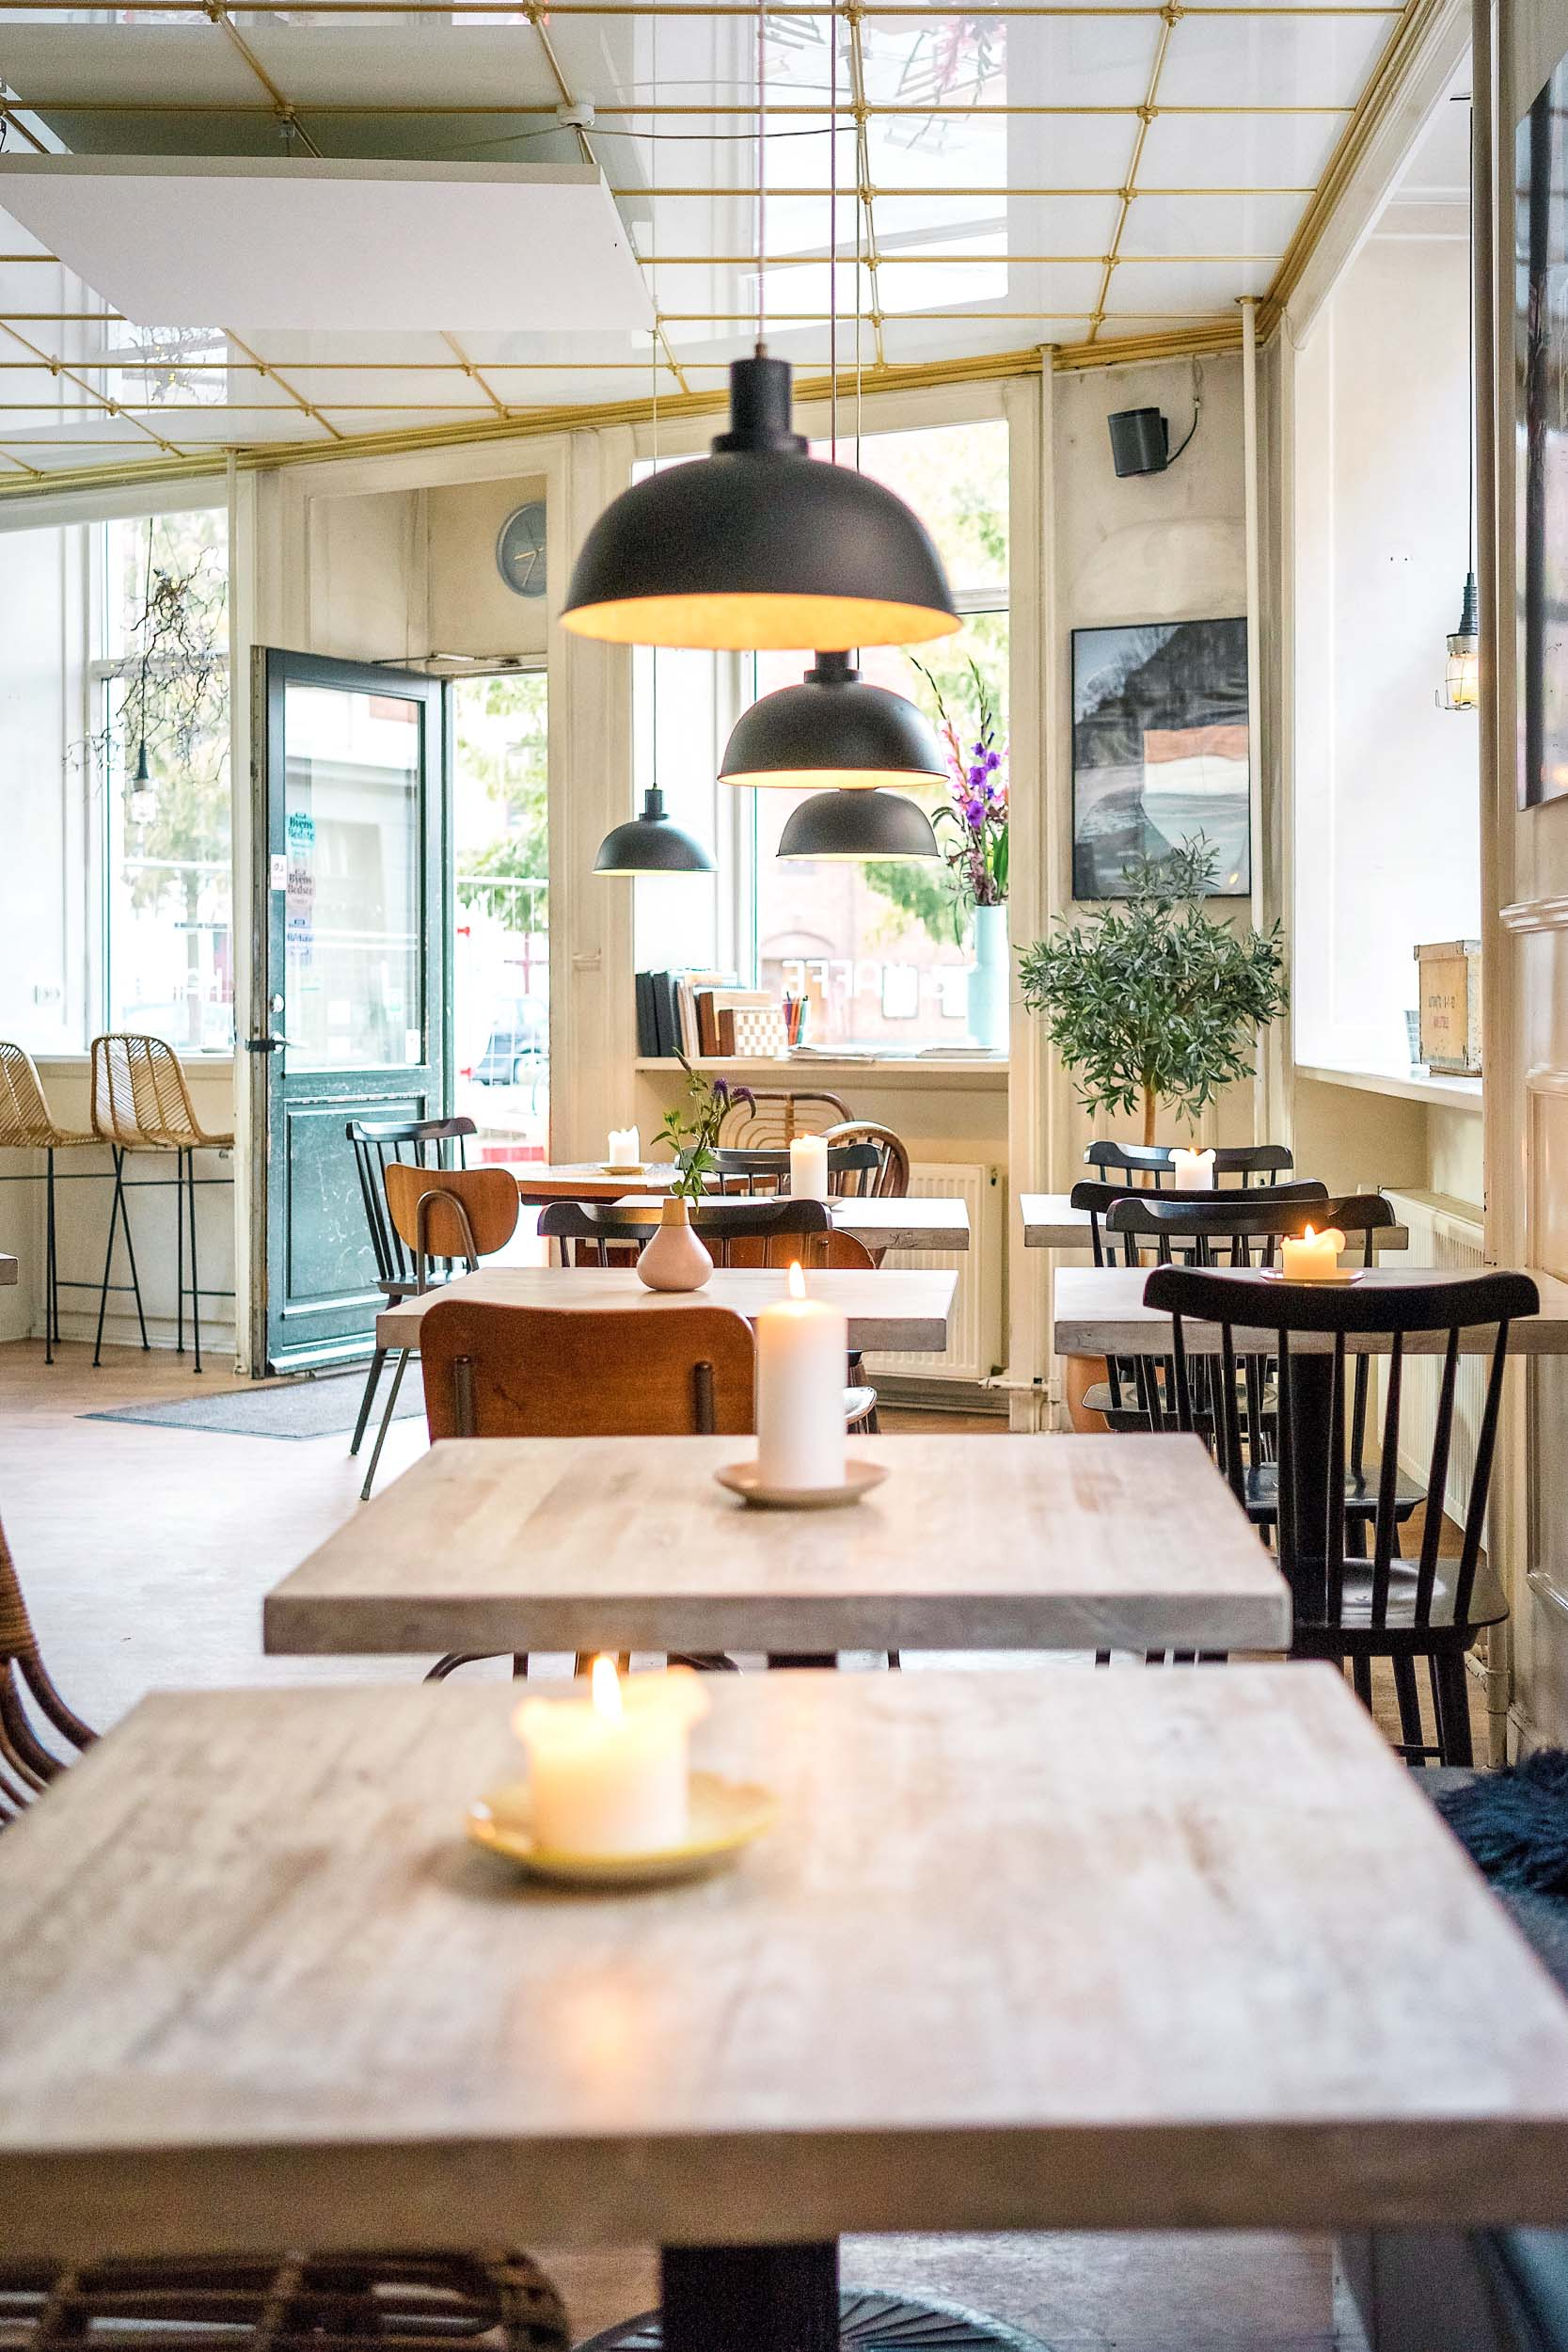 The best brunch in Copenhagen: Mad & Kaffe in Vesterbro